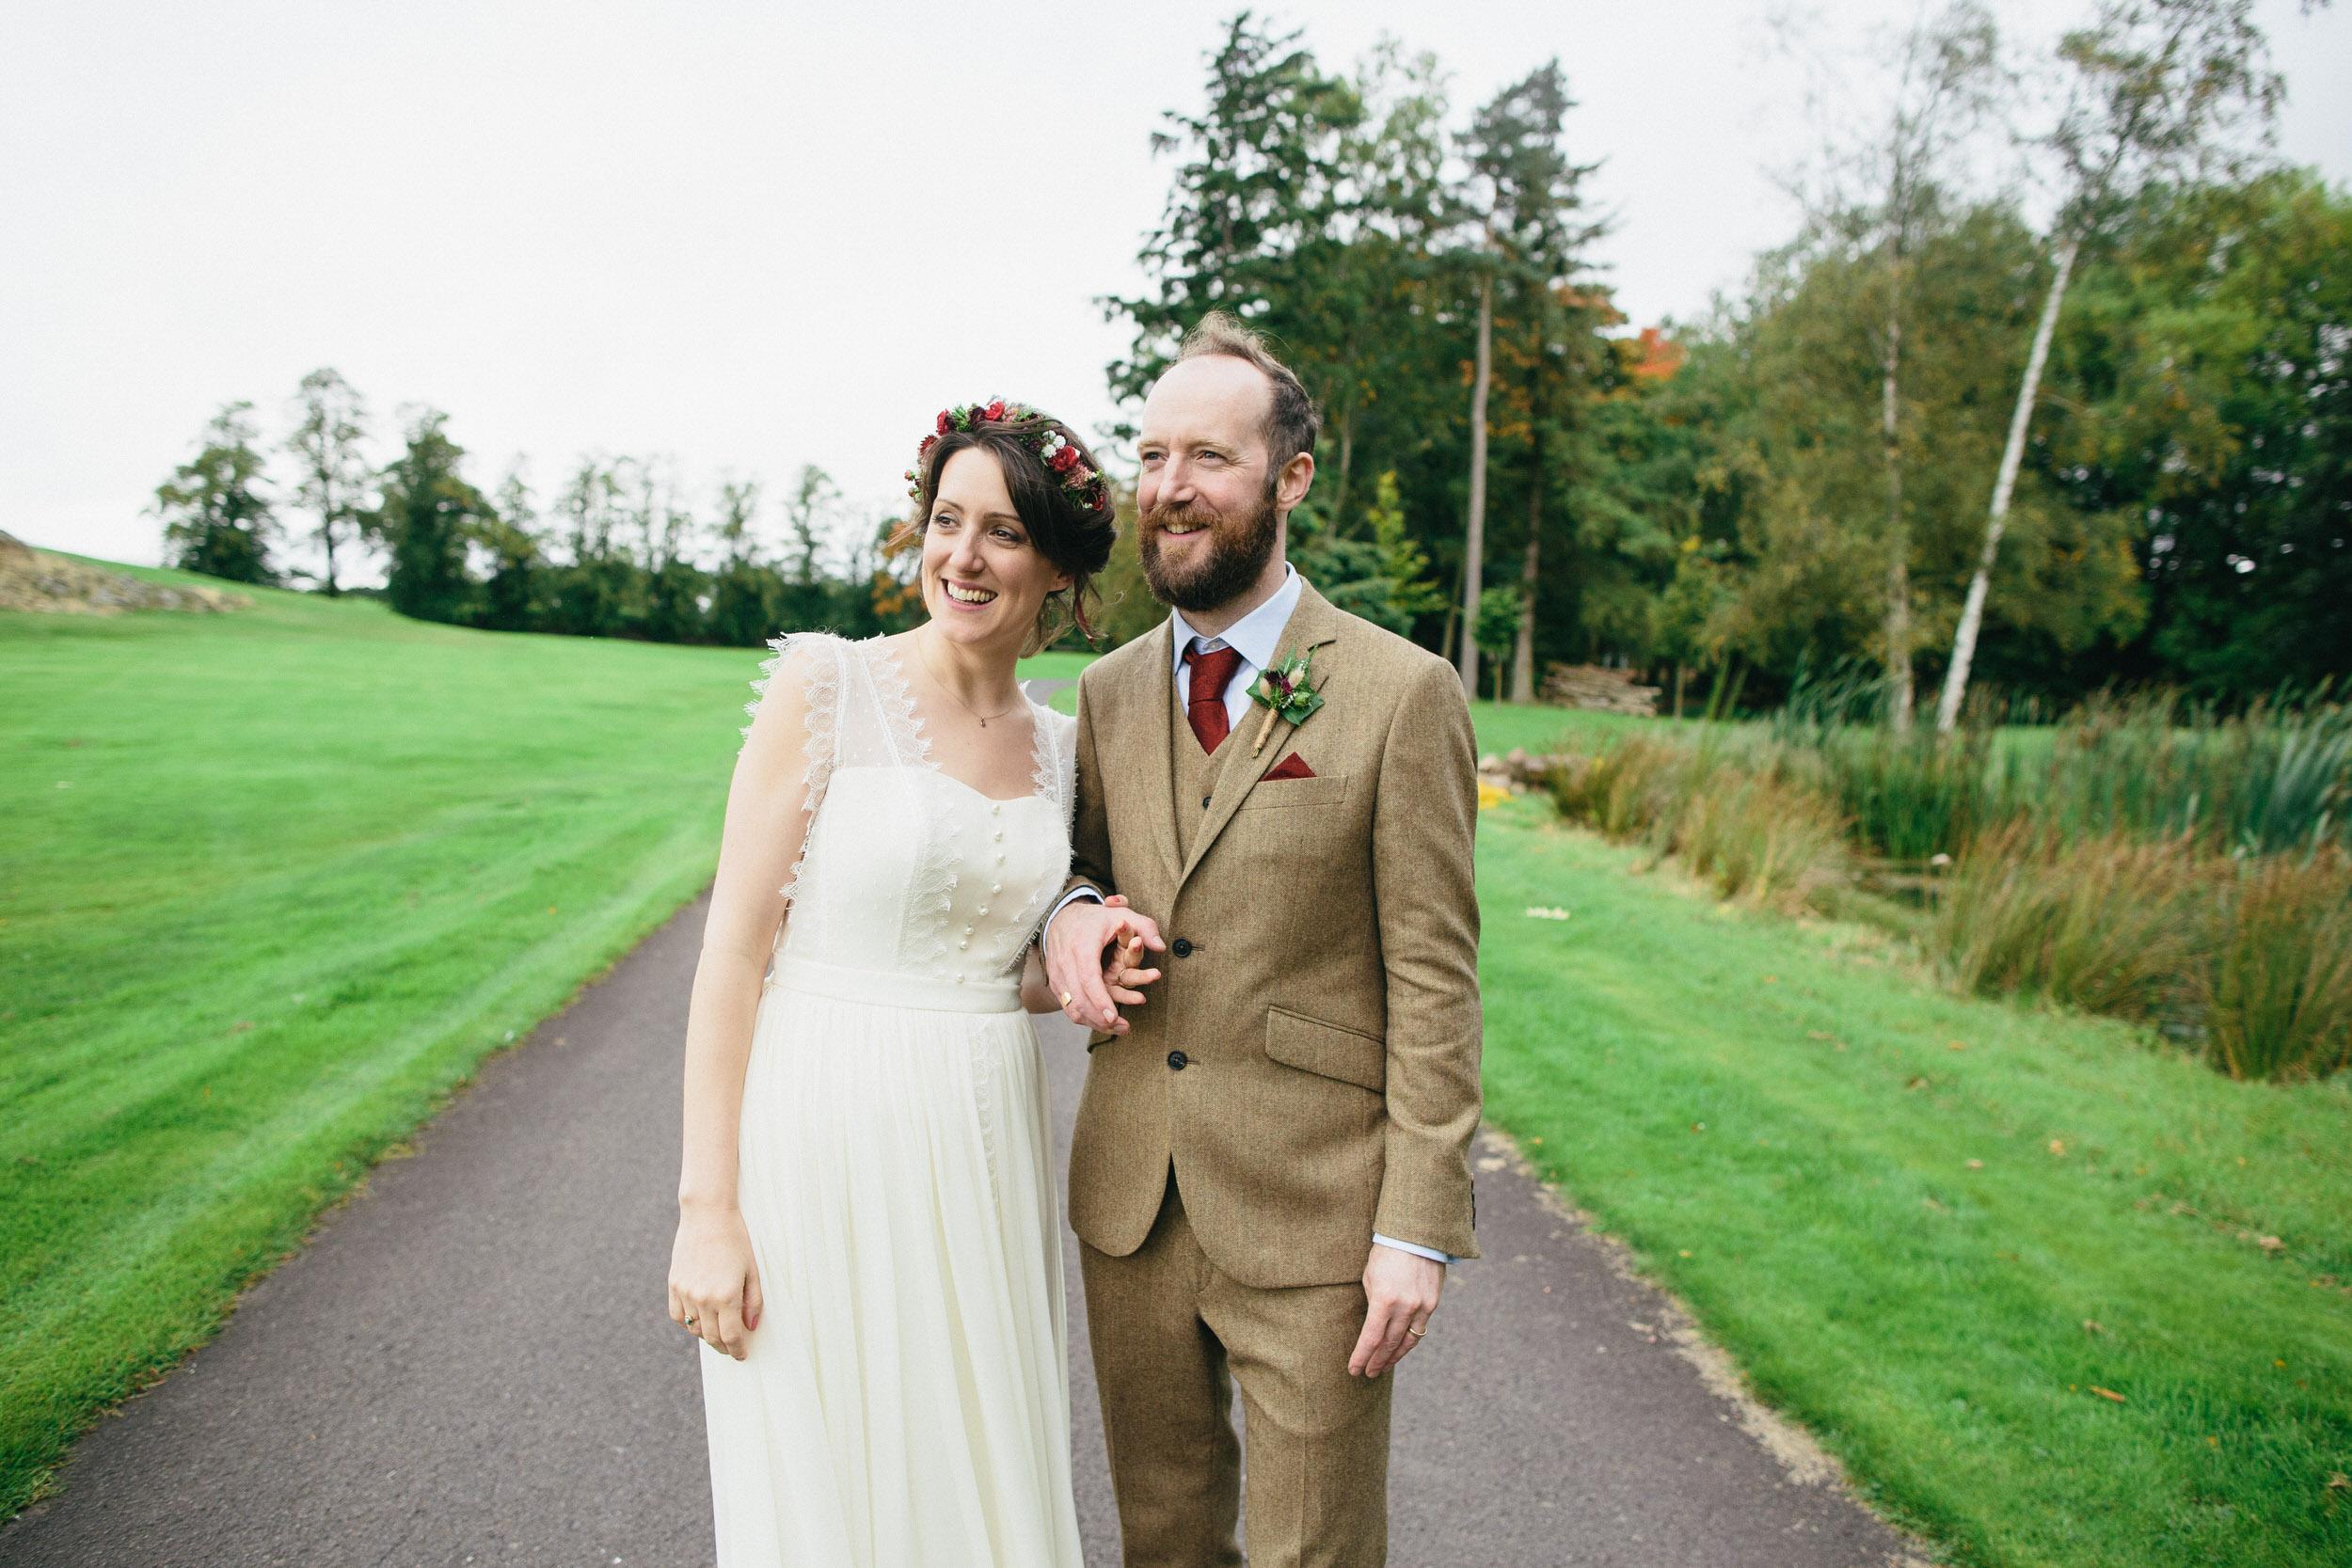 Quirky Wedding Photography Scotland Borders Biggar Hartree 071.jpg